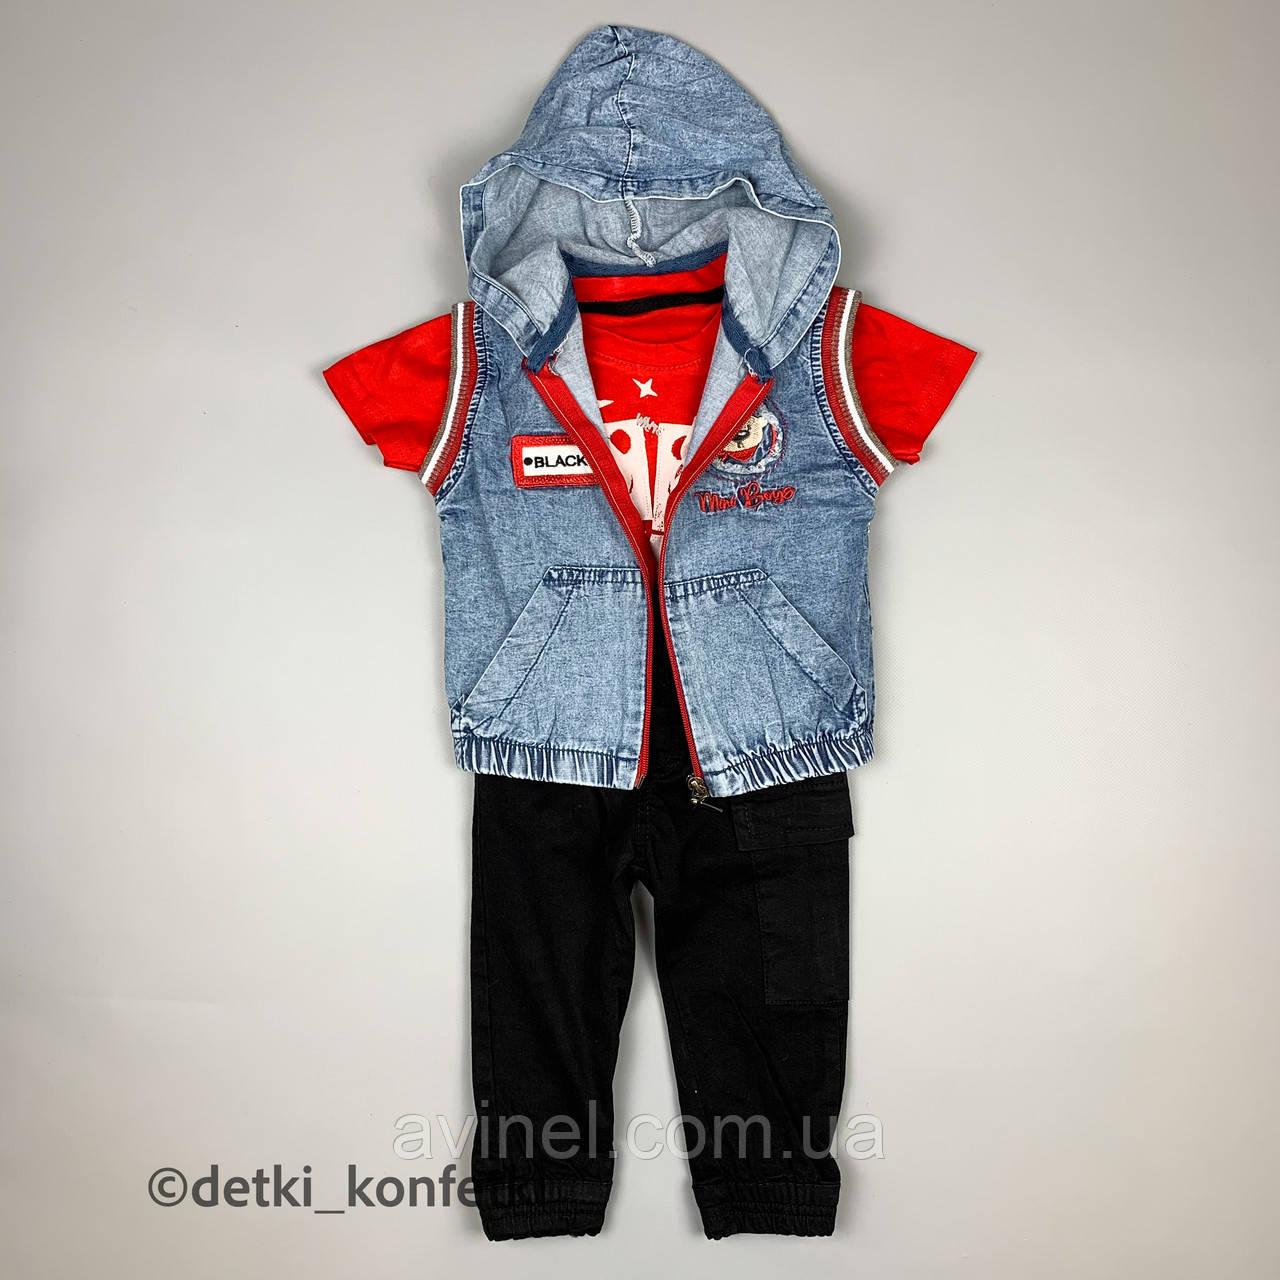 Комплект фут+штани+підтяжки+Червоний жилет 0255 concept Туреччина 80(р) 86